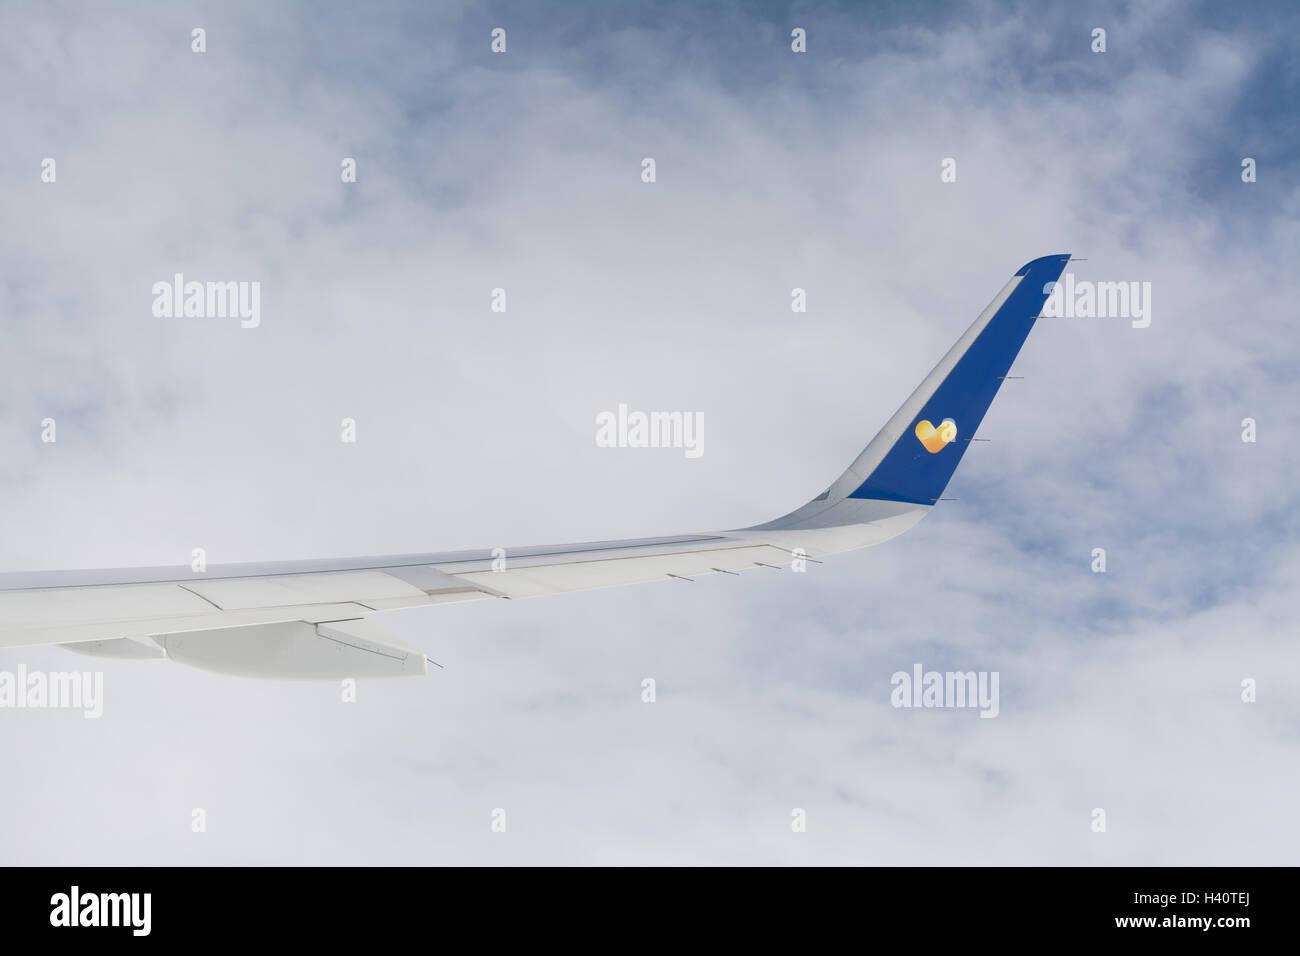 Aile d'avion Thomas Cook avec logo coeur Photo Stock